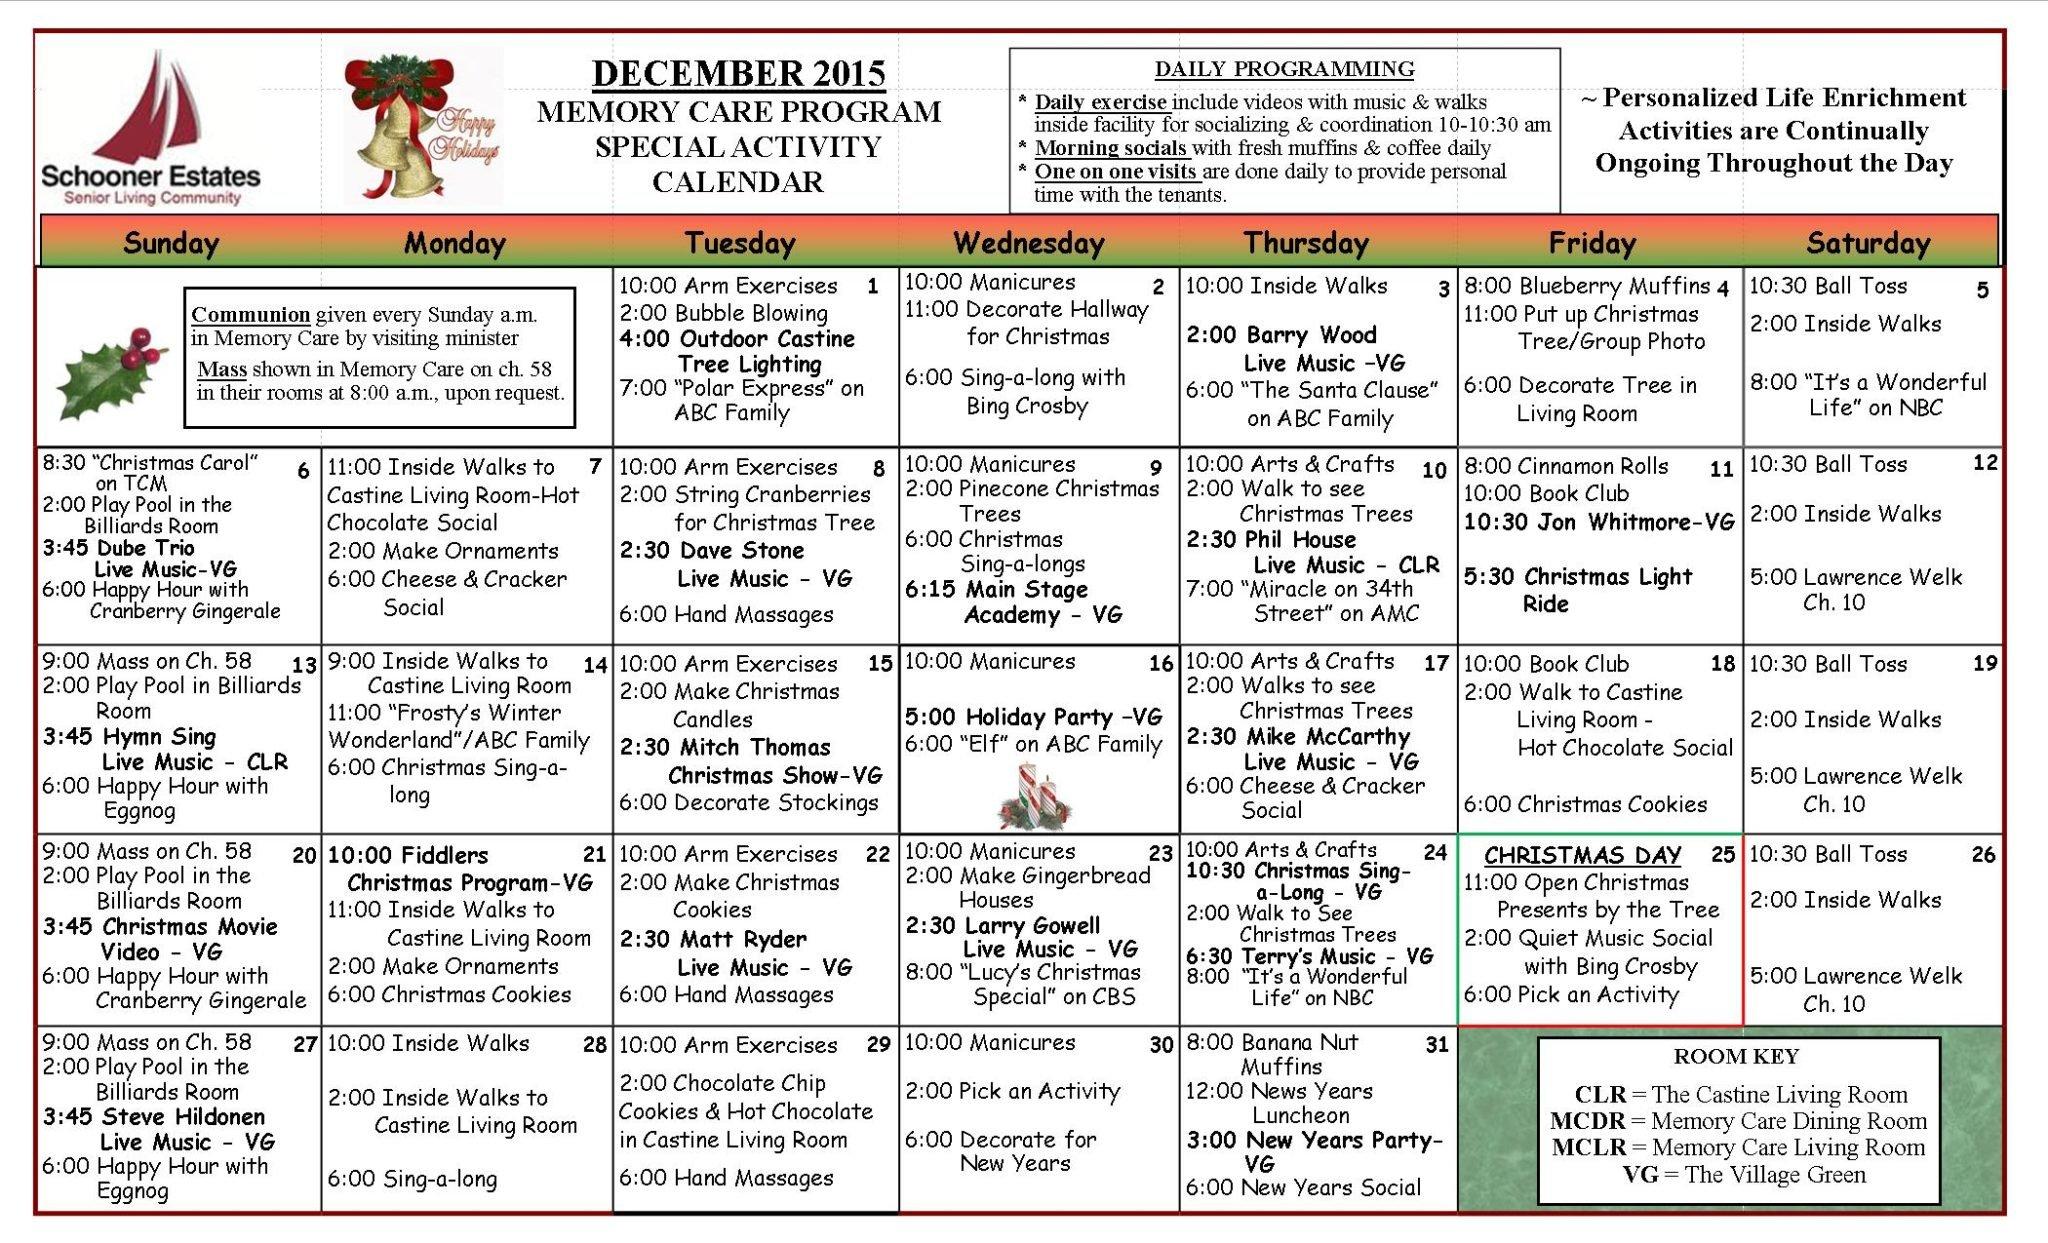 December 2015 Memory Care Activity Calendar